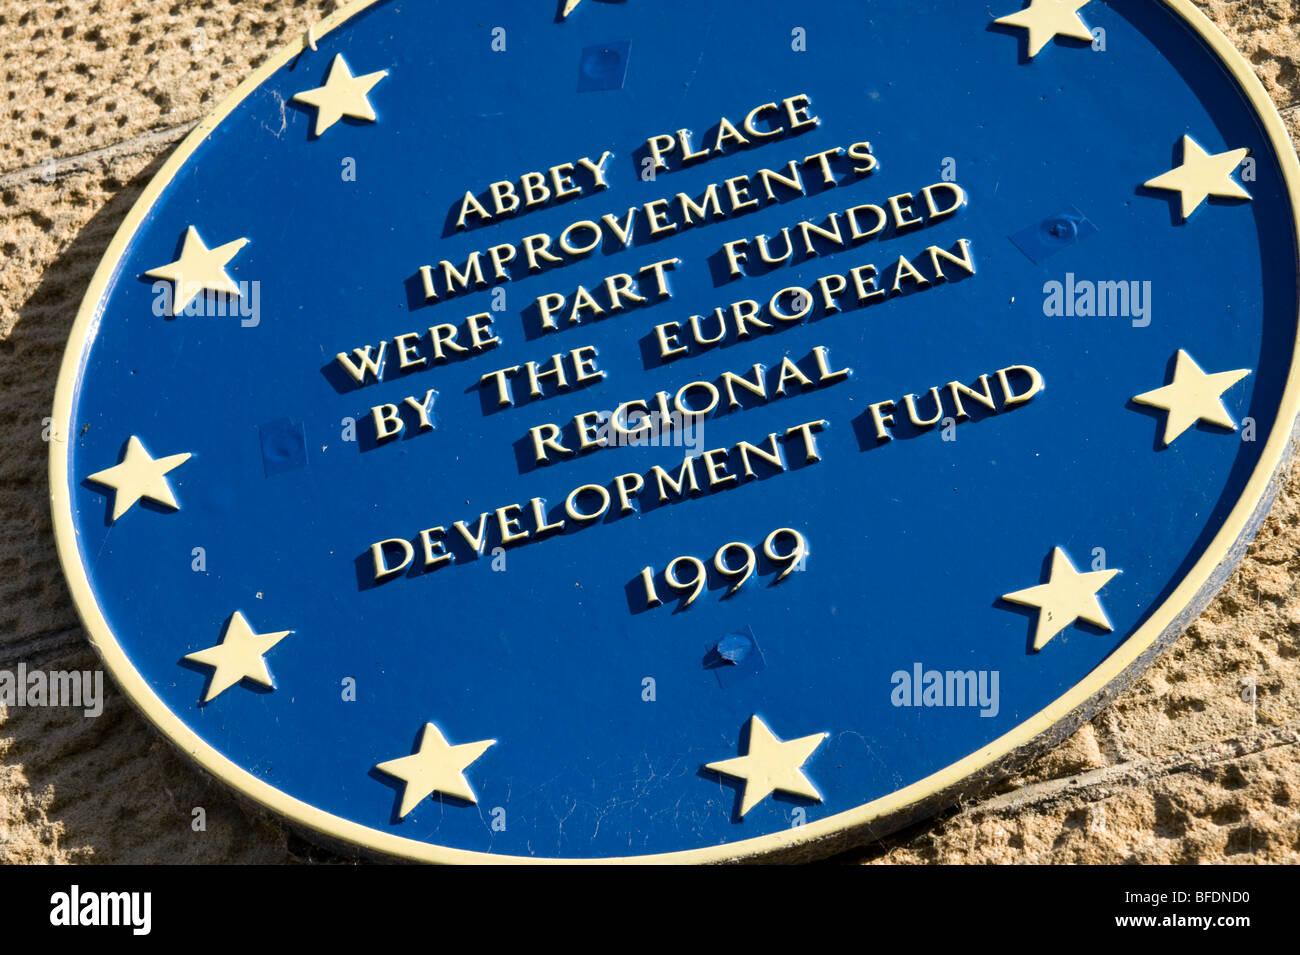 European funding wall plaque in Scotland - Stock Image